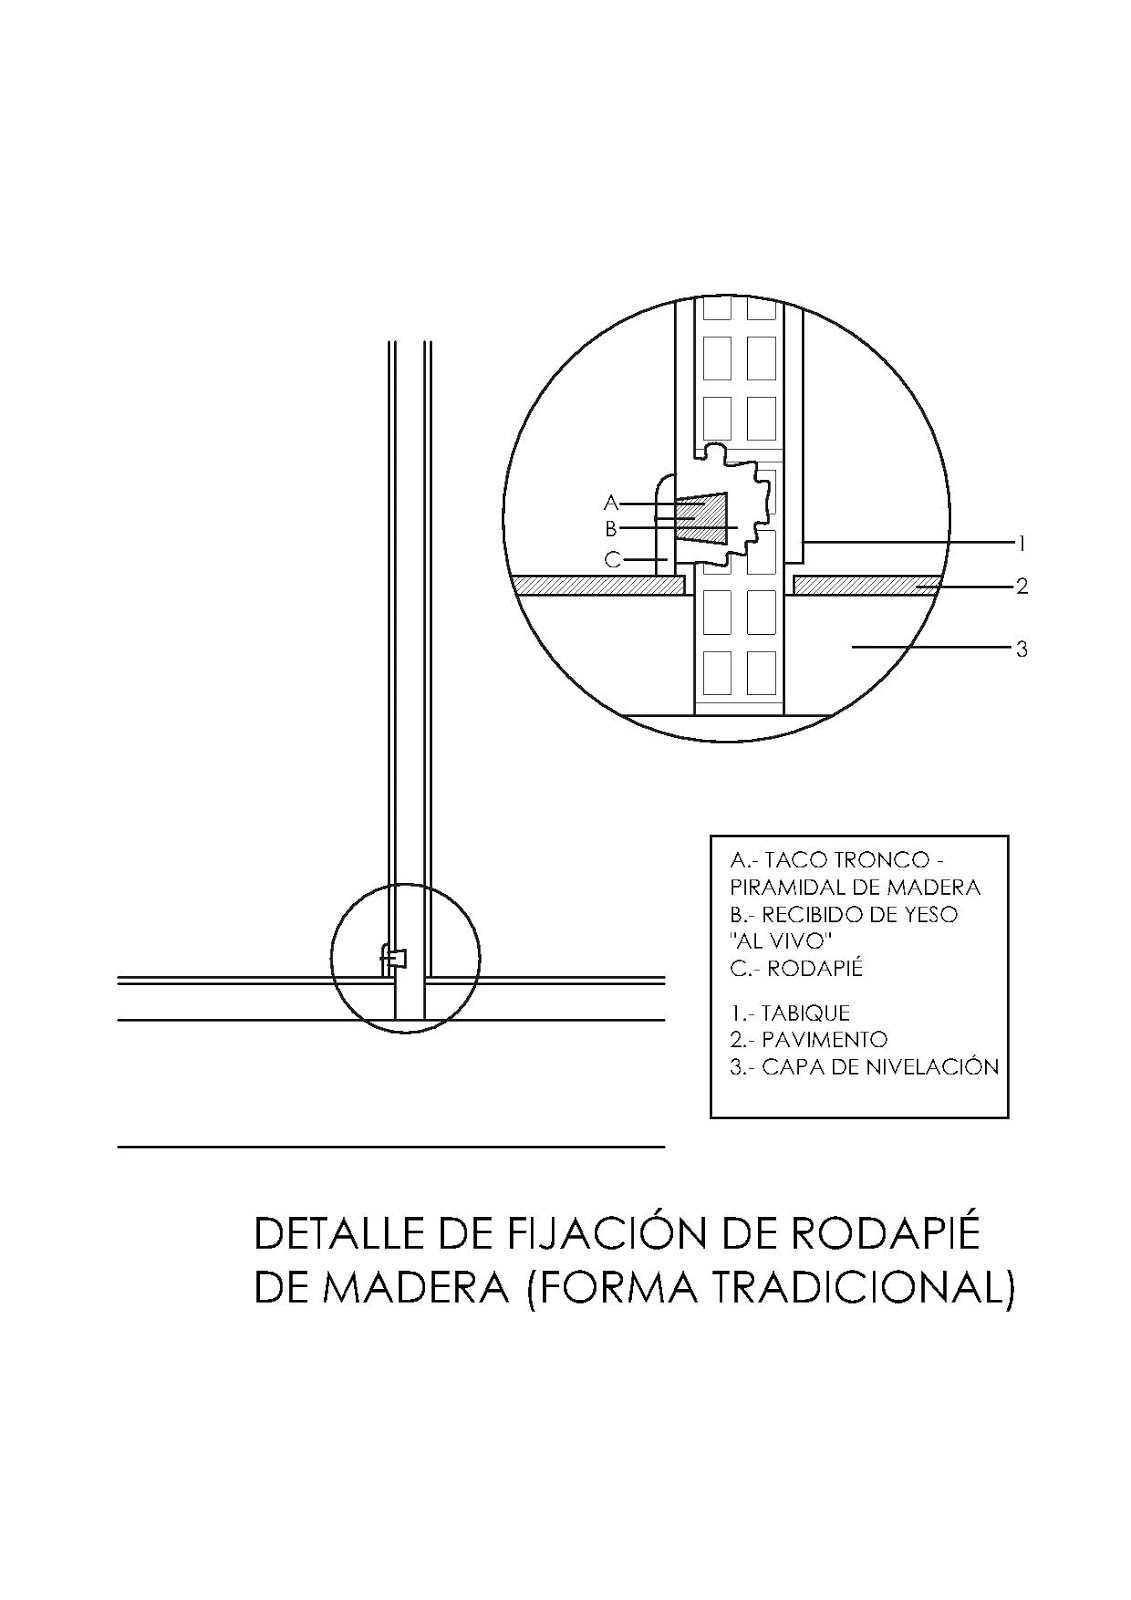 Peritararquitectura perforaci n de tuber a de calefacci n - Tuberias de calefaccion ...